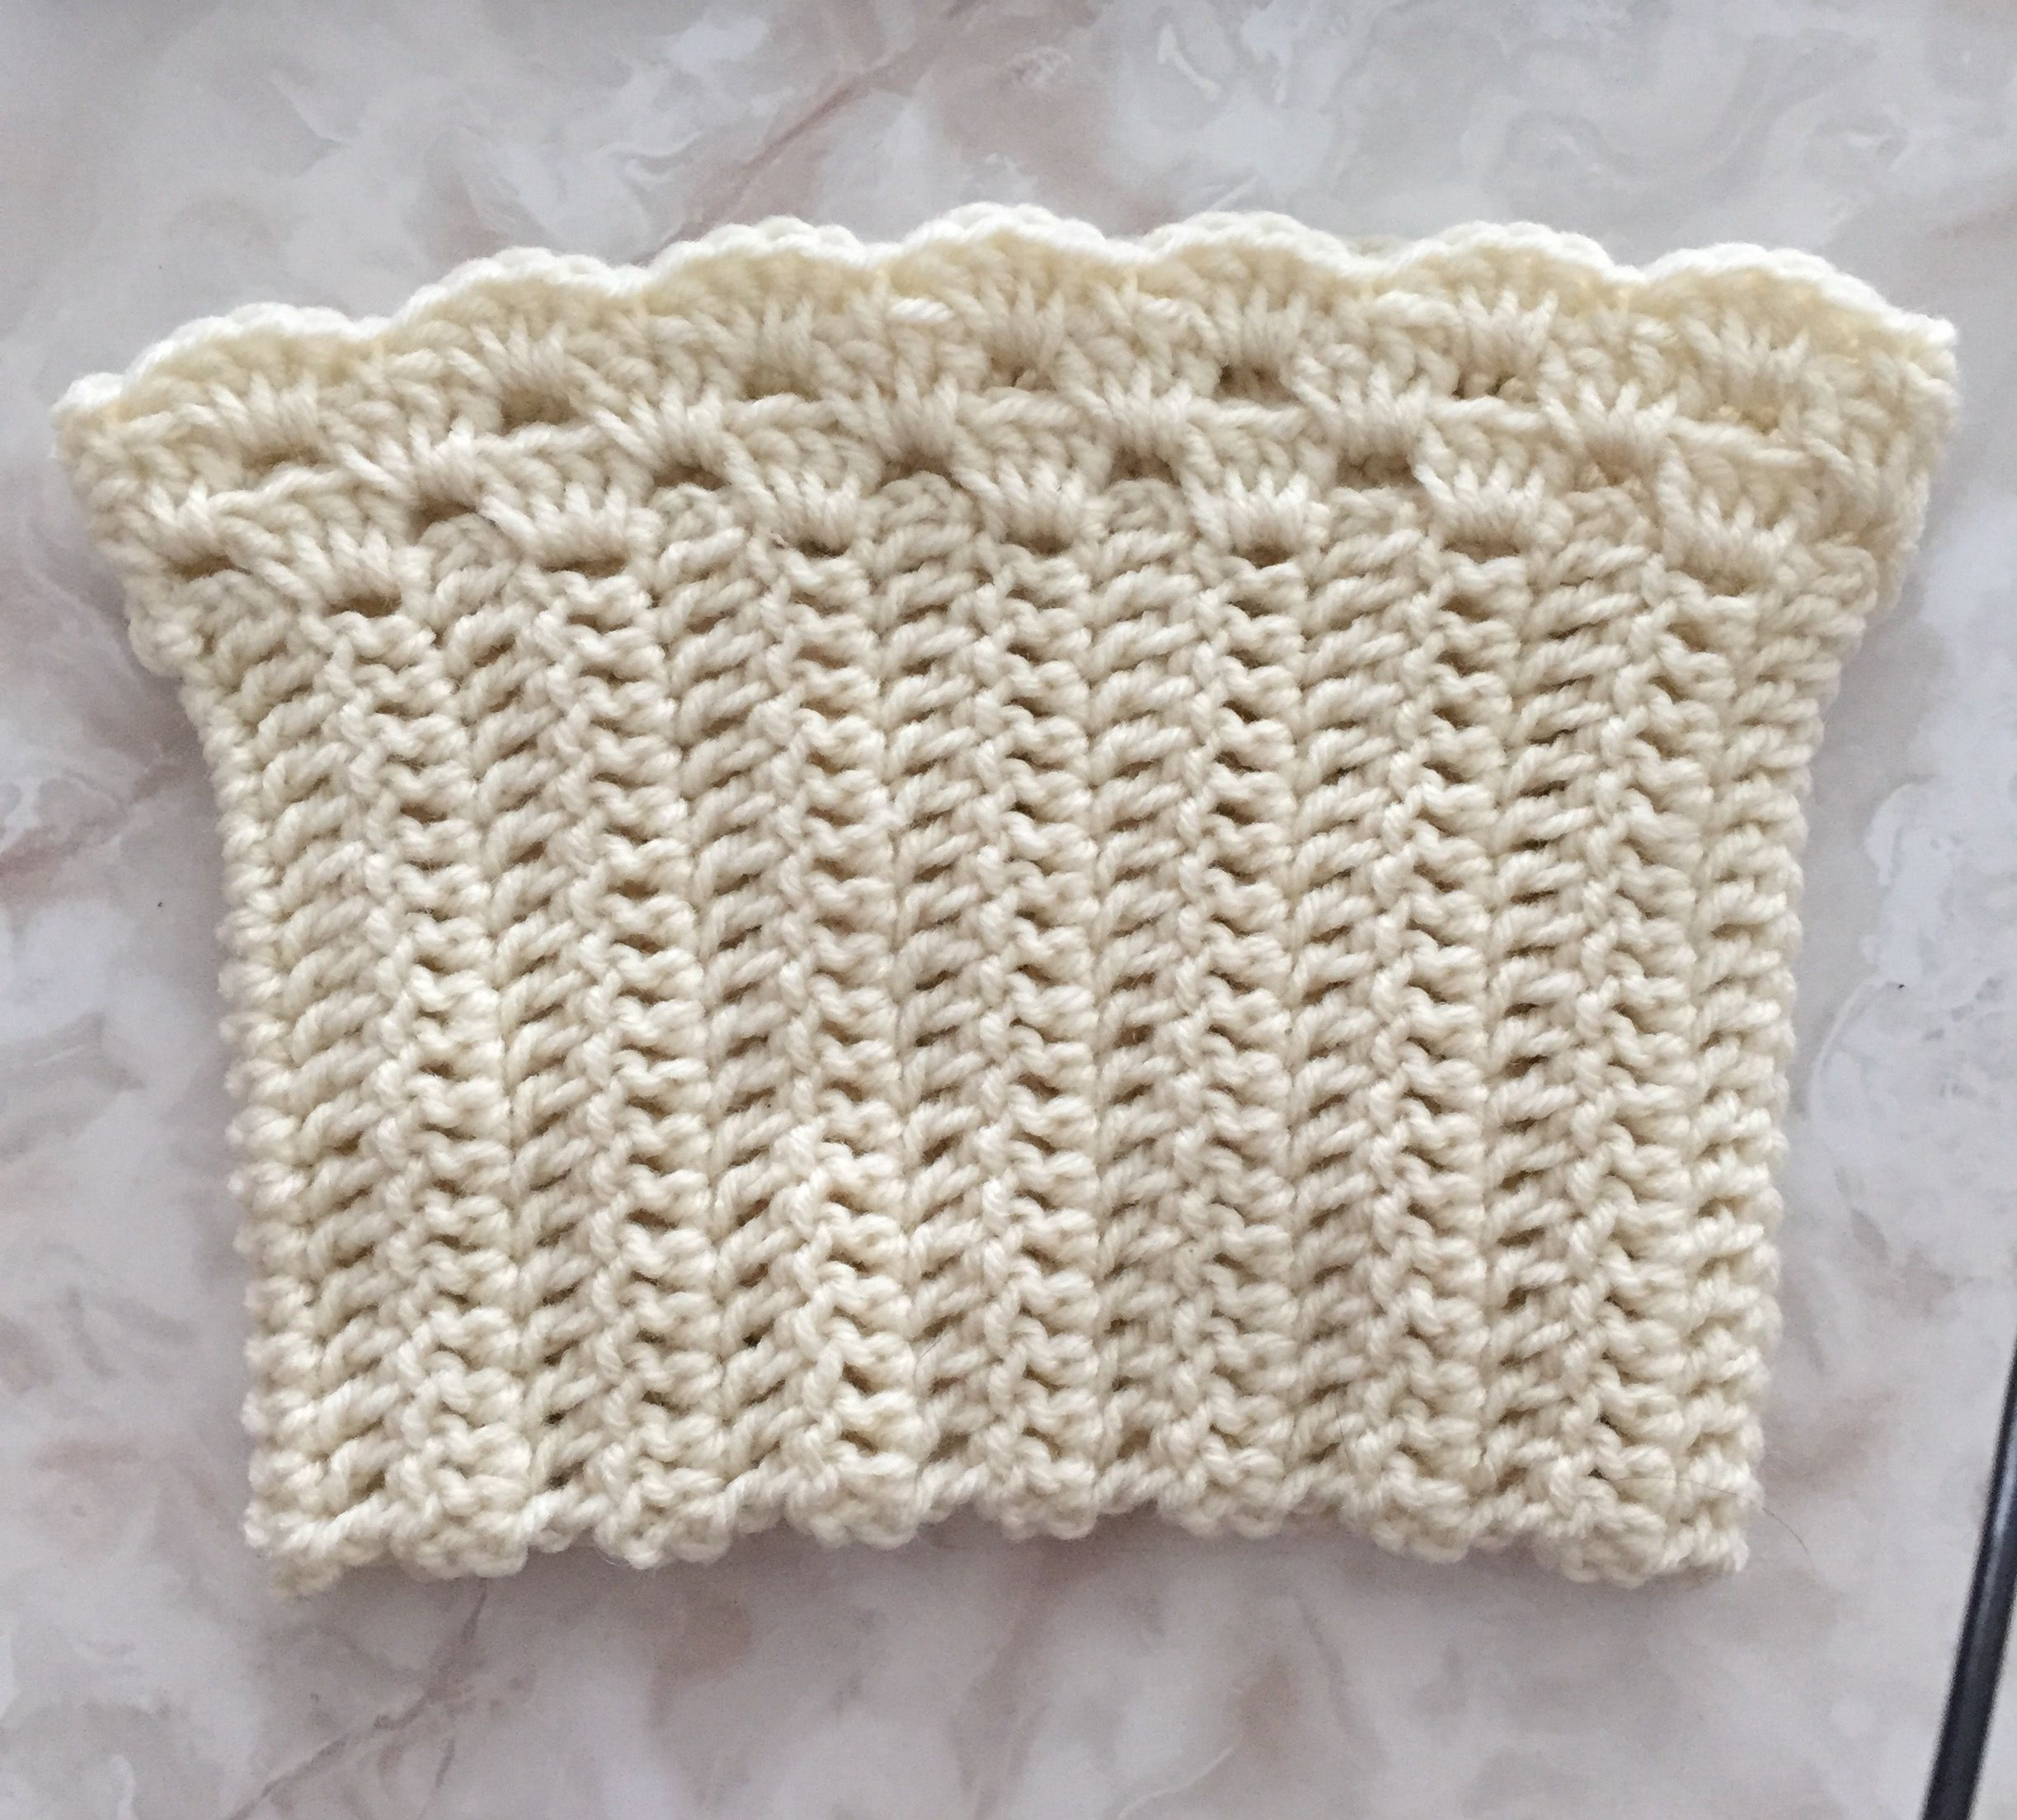 Lacy boot cuff More | crochet | Pinterest | Botas, Tejido y Puños